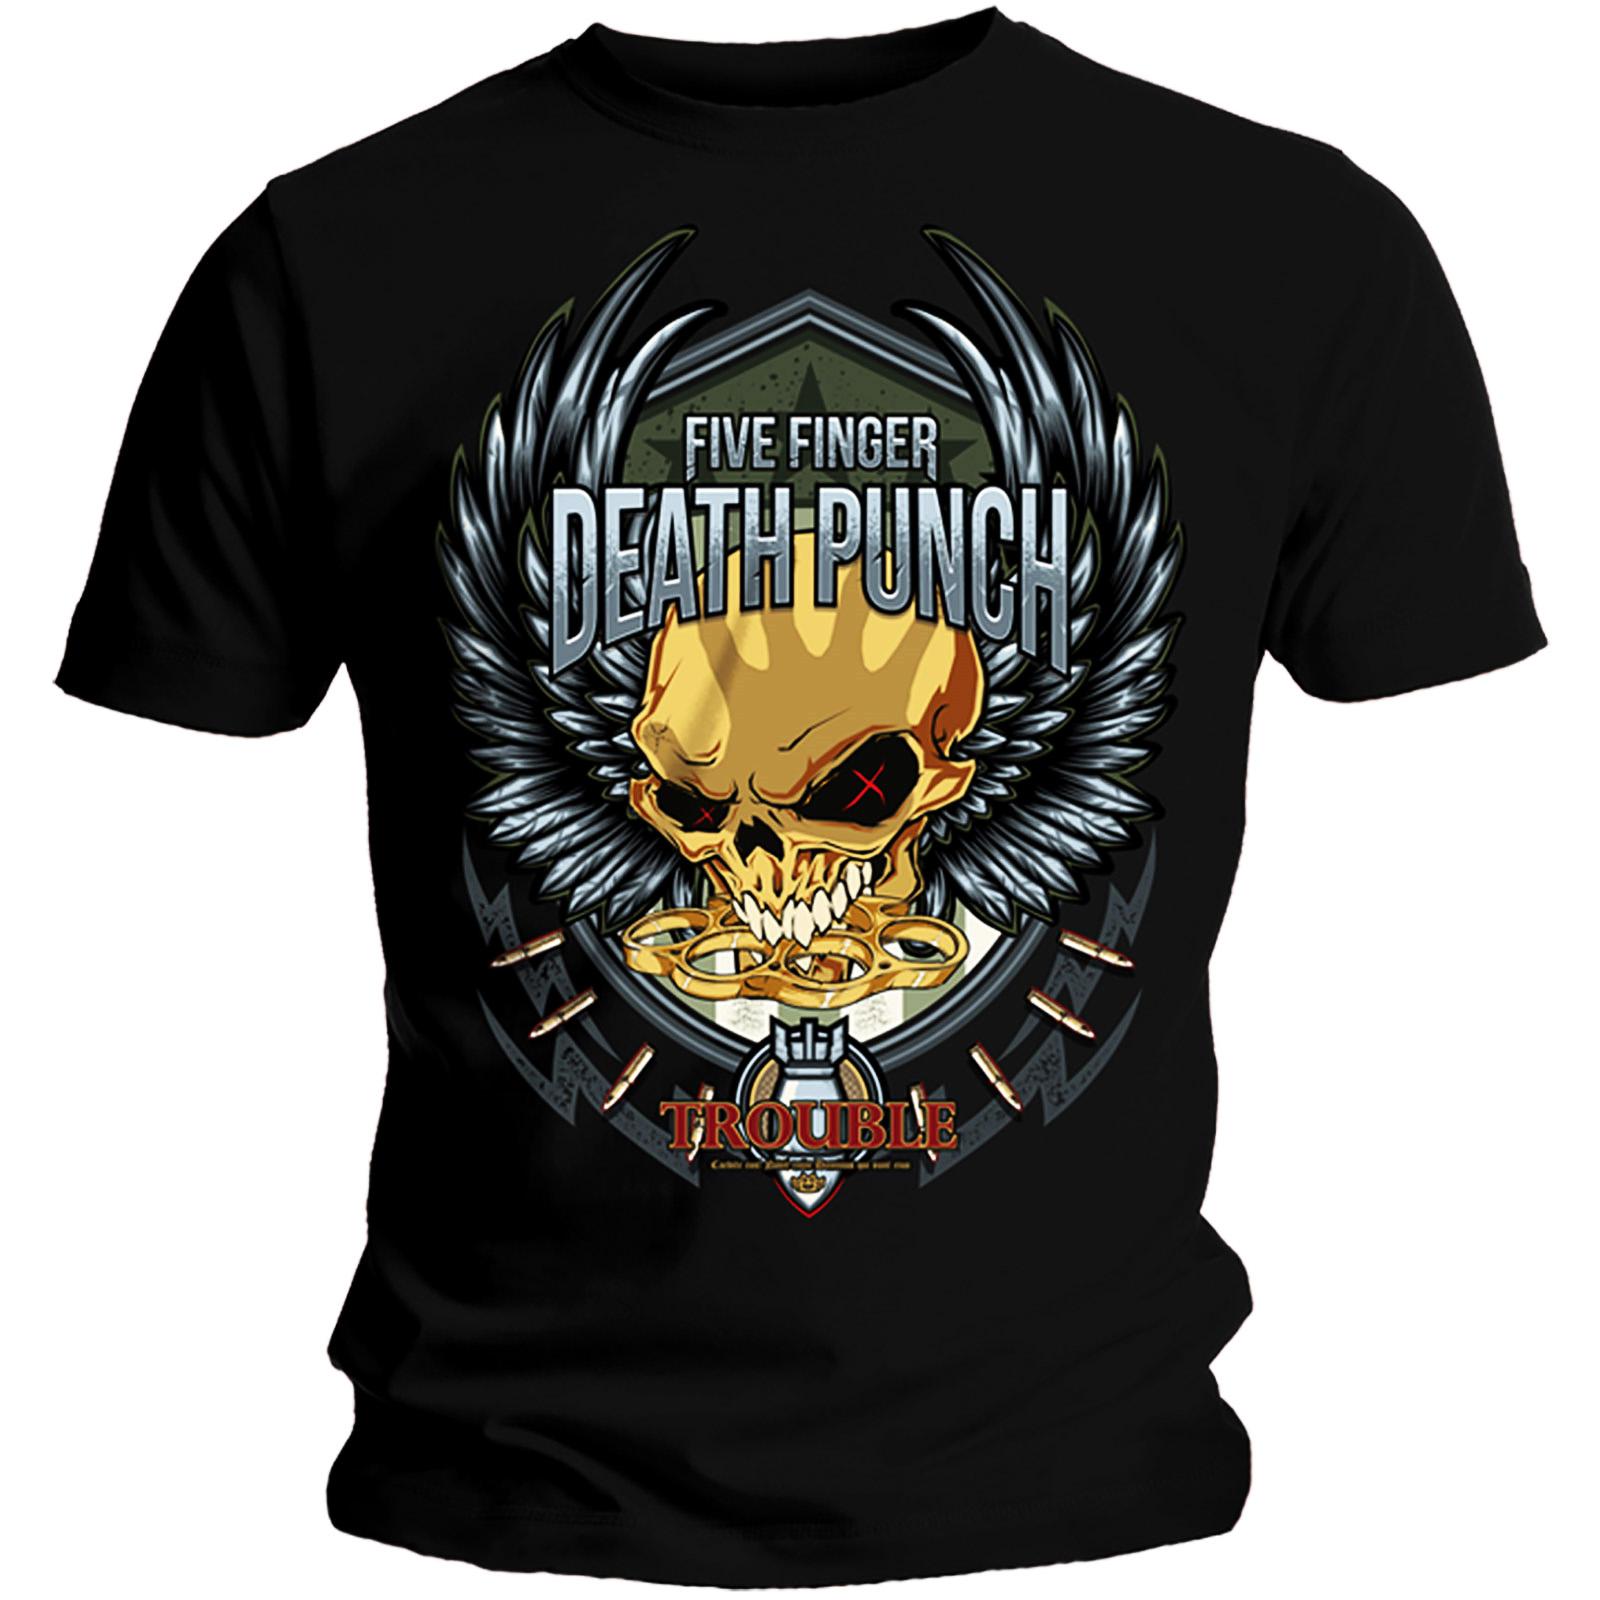 Official-T-Shirt-Five-Finger-Death-Punch-TROUBLE-Decade-of-Destruction-All-Sizes thumbnail 9